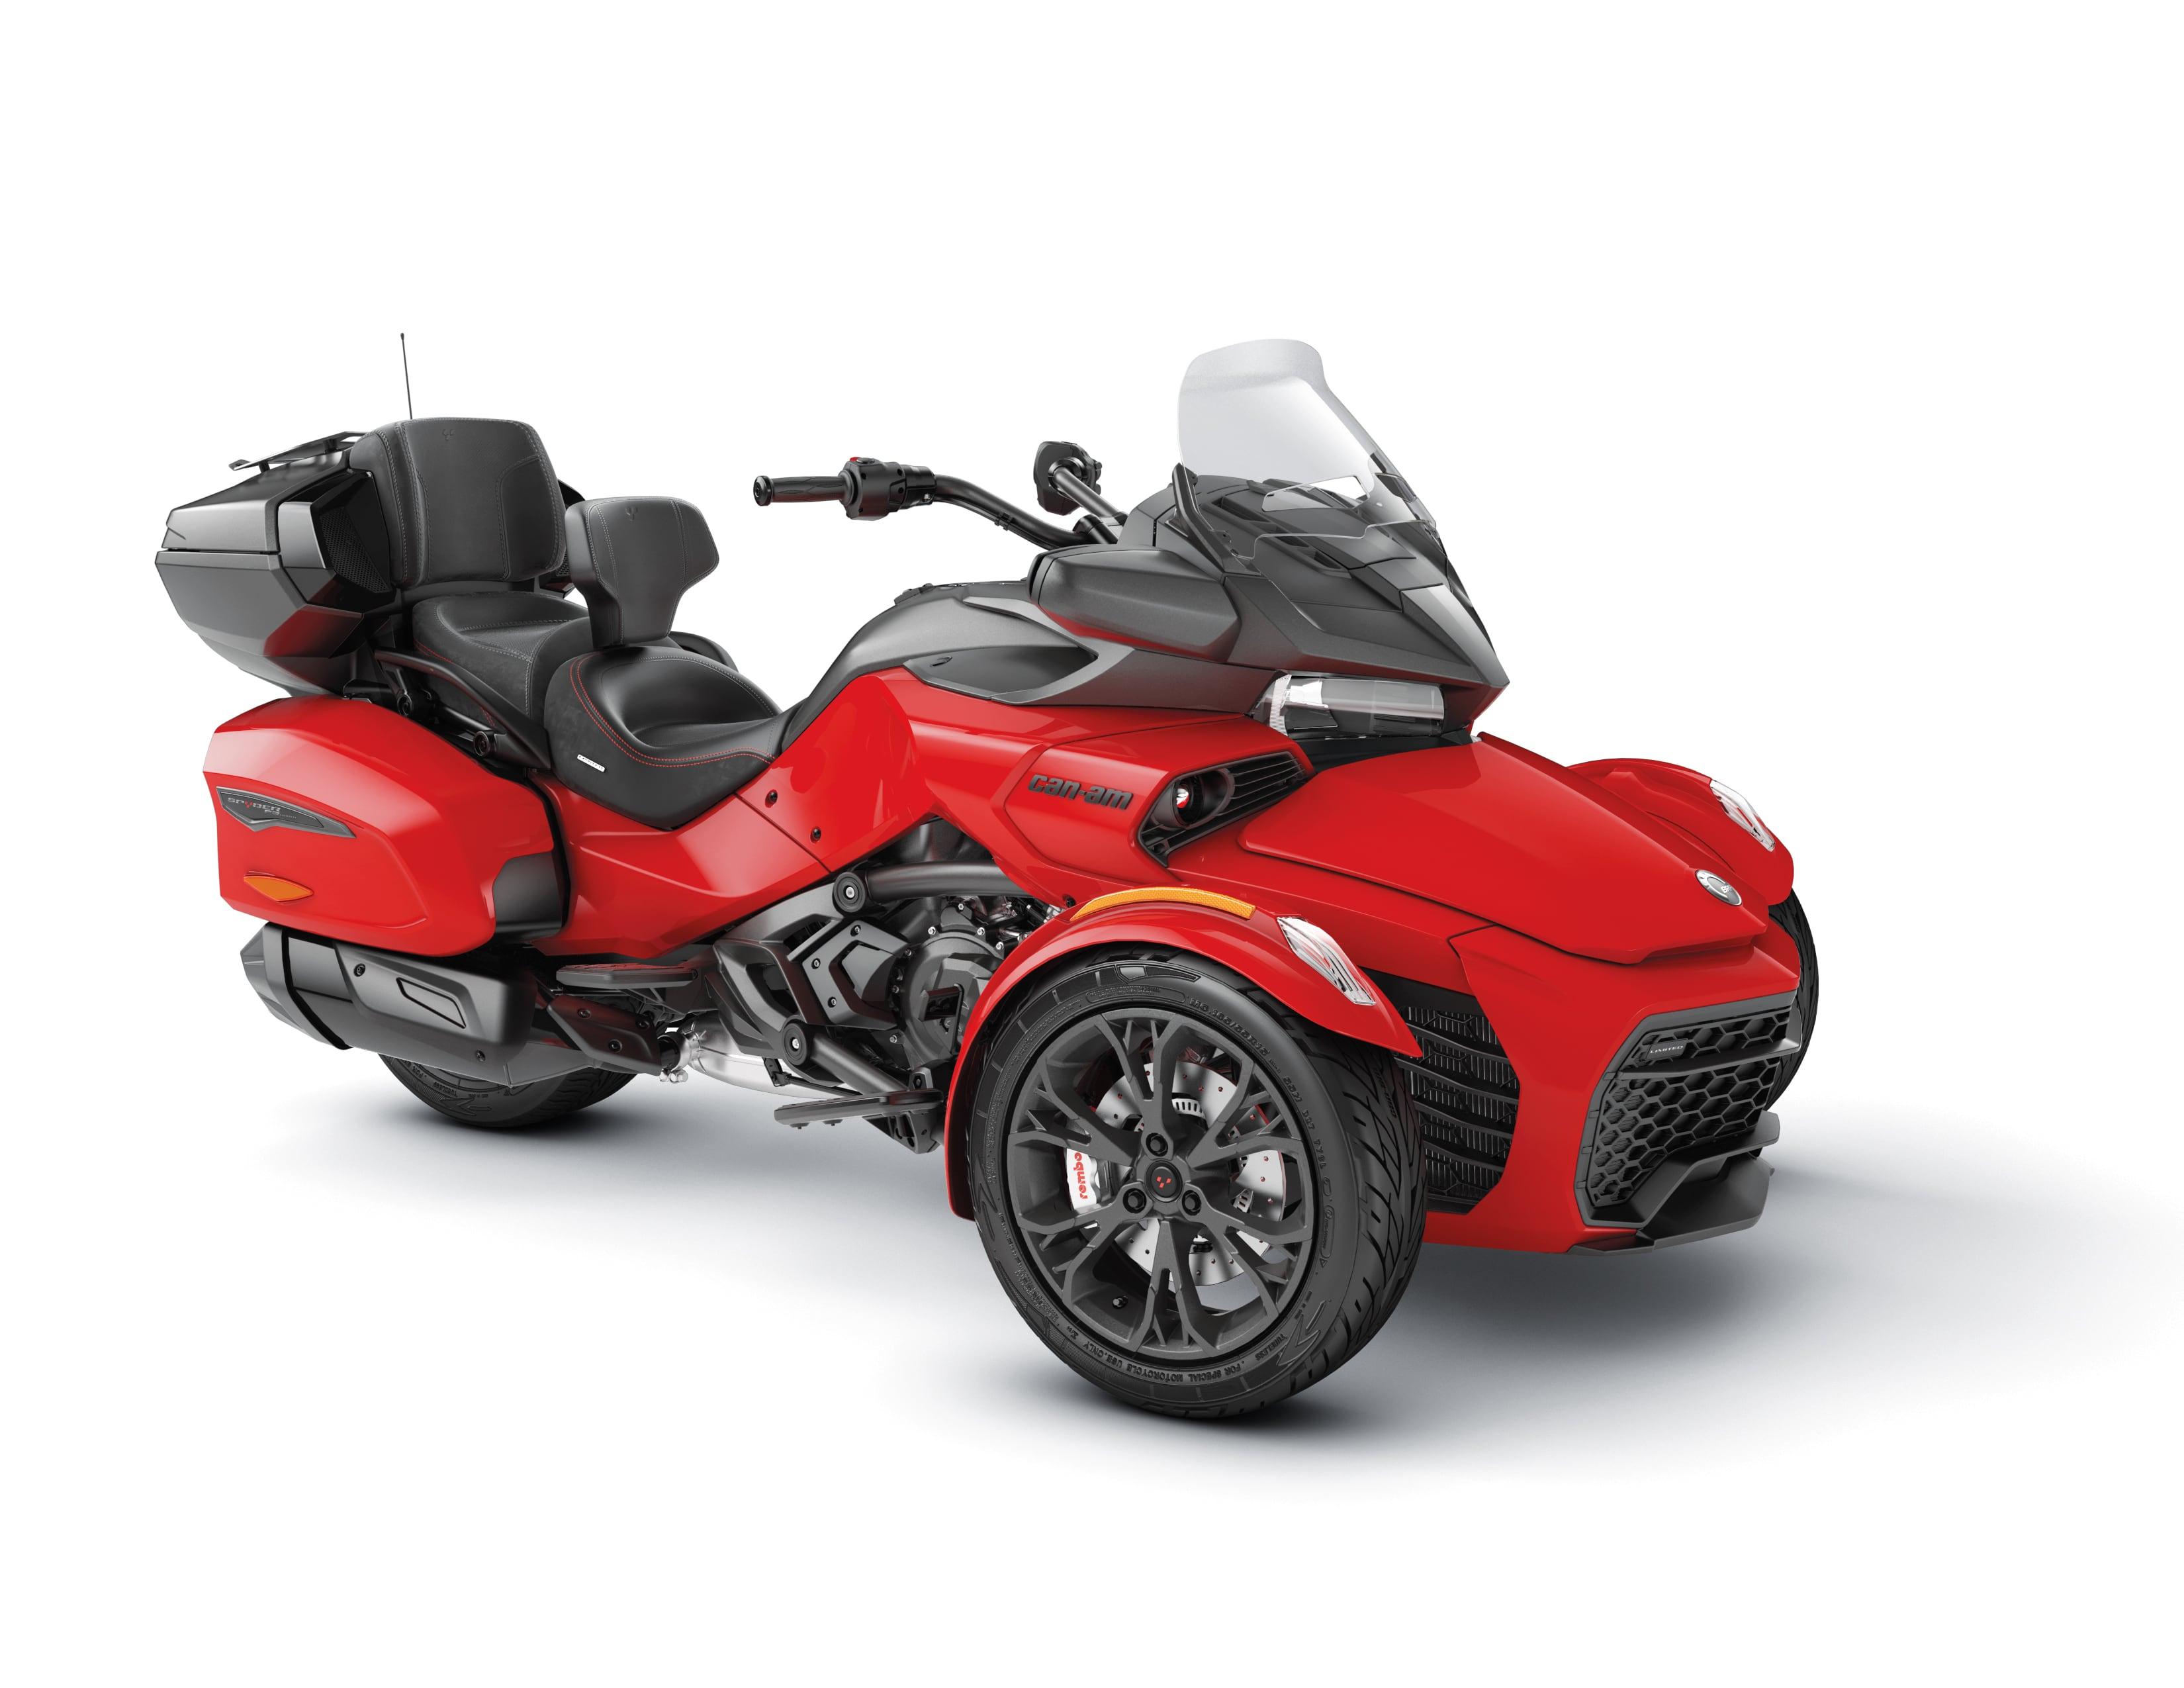 SPYDER F3 LTD 1330ACE SE6 VIPER RED 2022